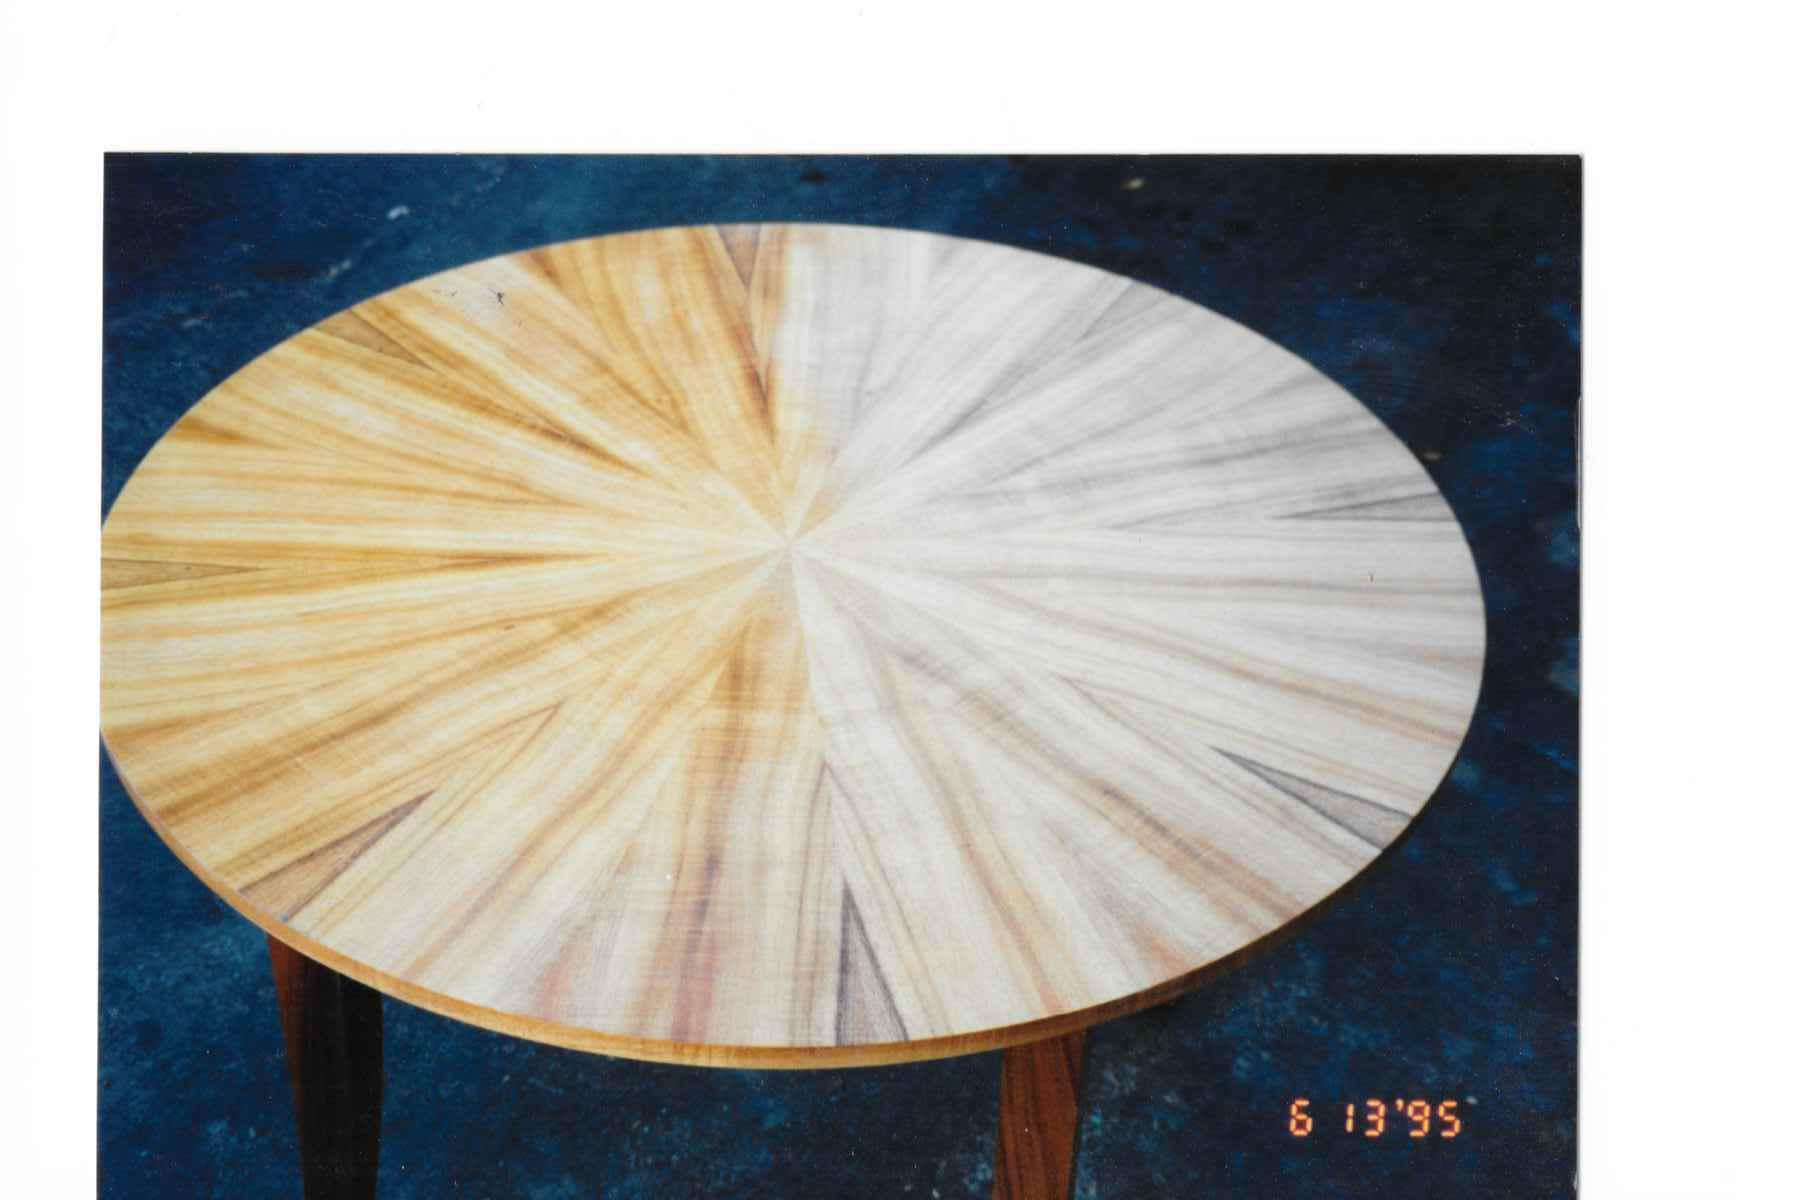 Koa Veneer table top